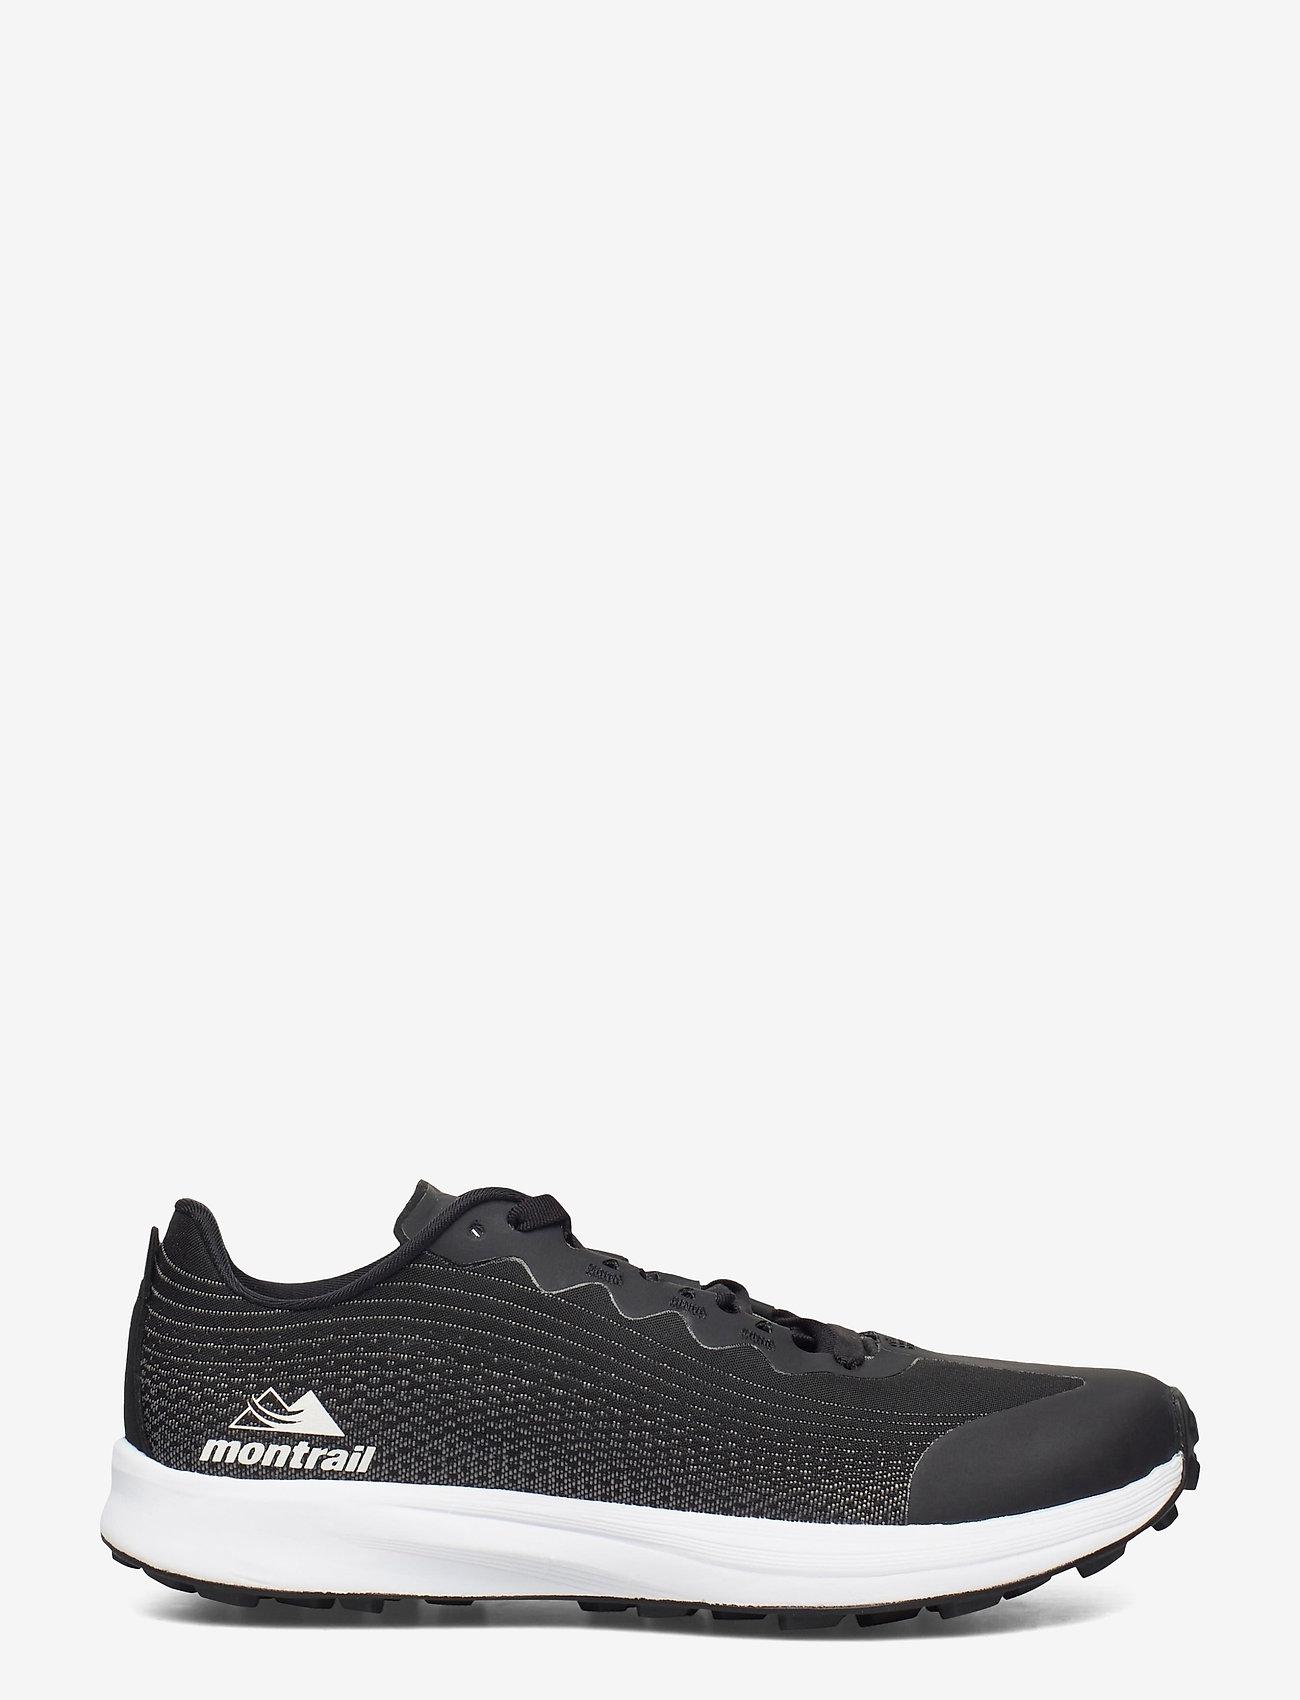 Columbia - COLUMBIA MONTRAIL F.K.T.™ LITE - running shoes - black - 1